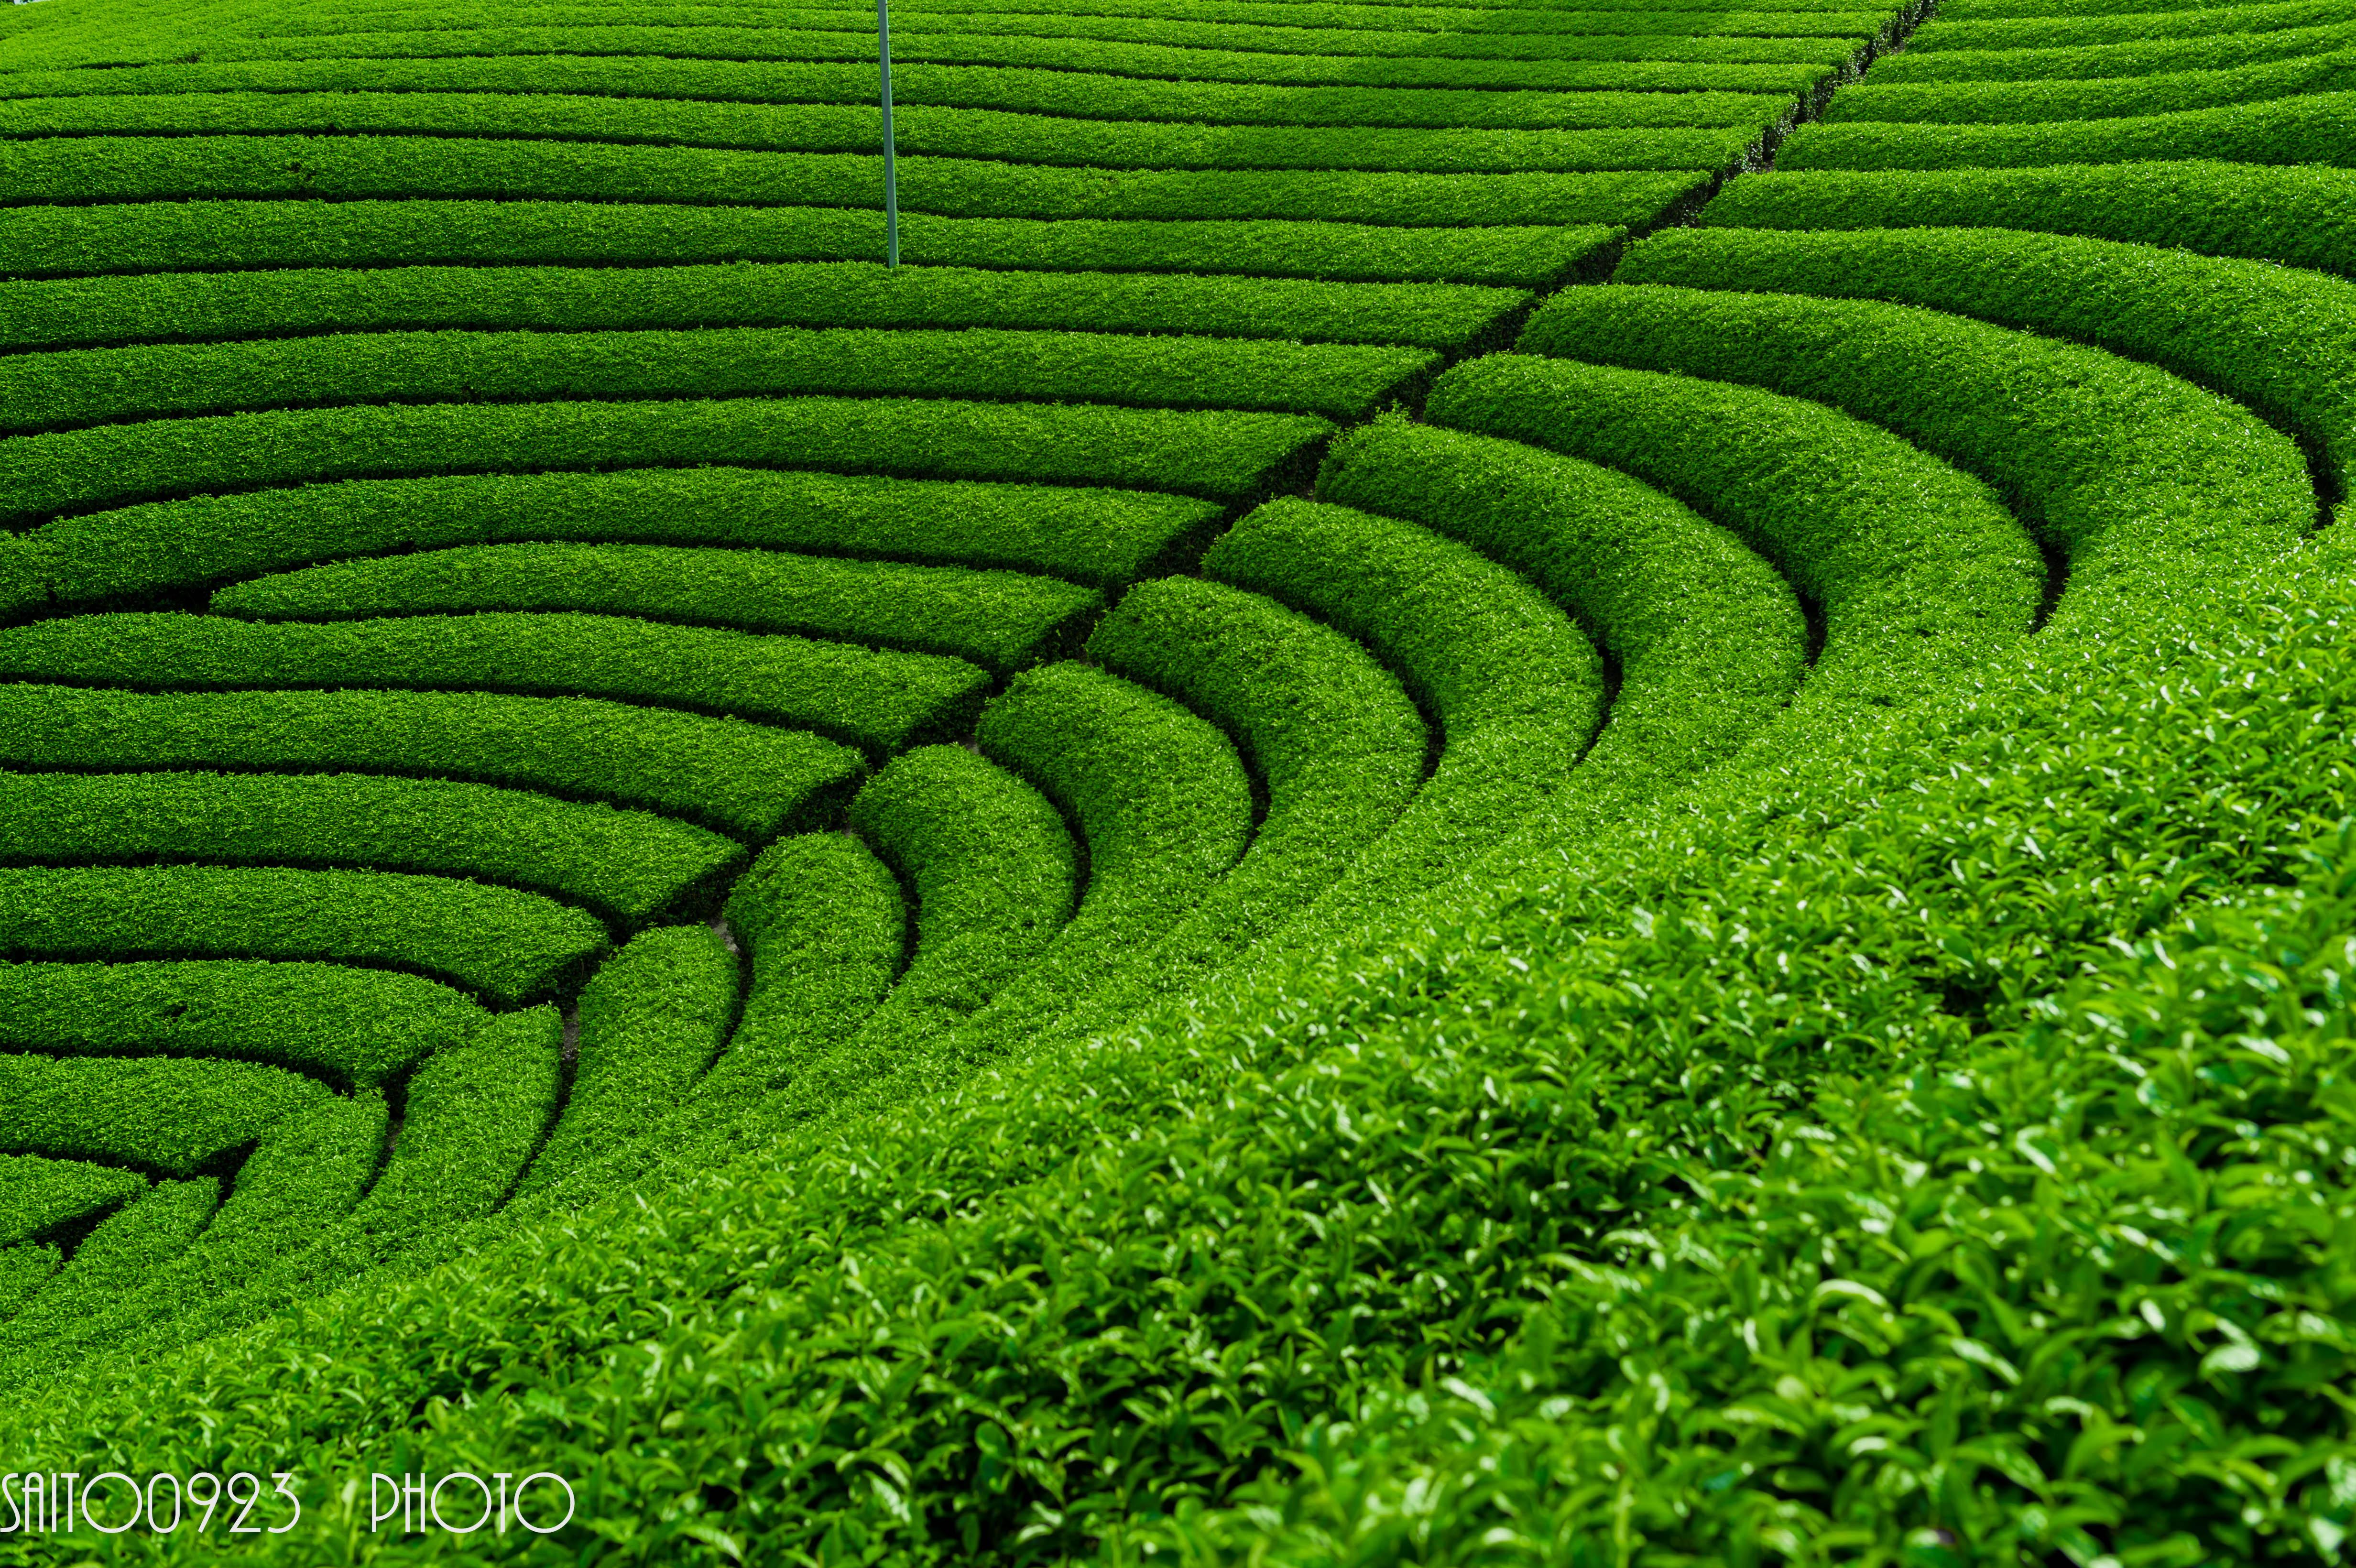 Hintergrundbilder : Japan, Landschaft, Gras, Feld, Grün, Kamera ...